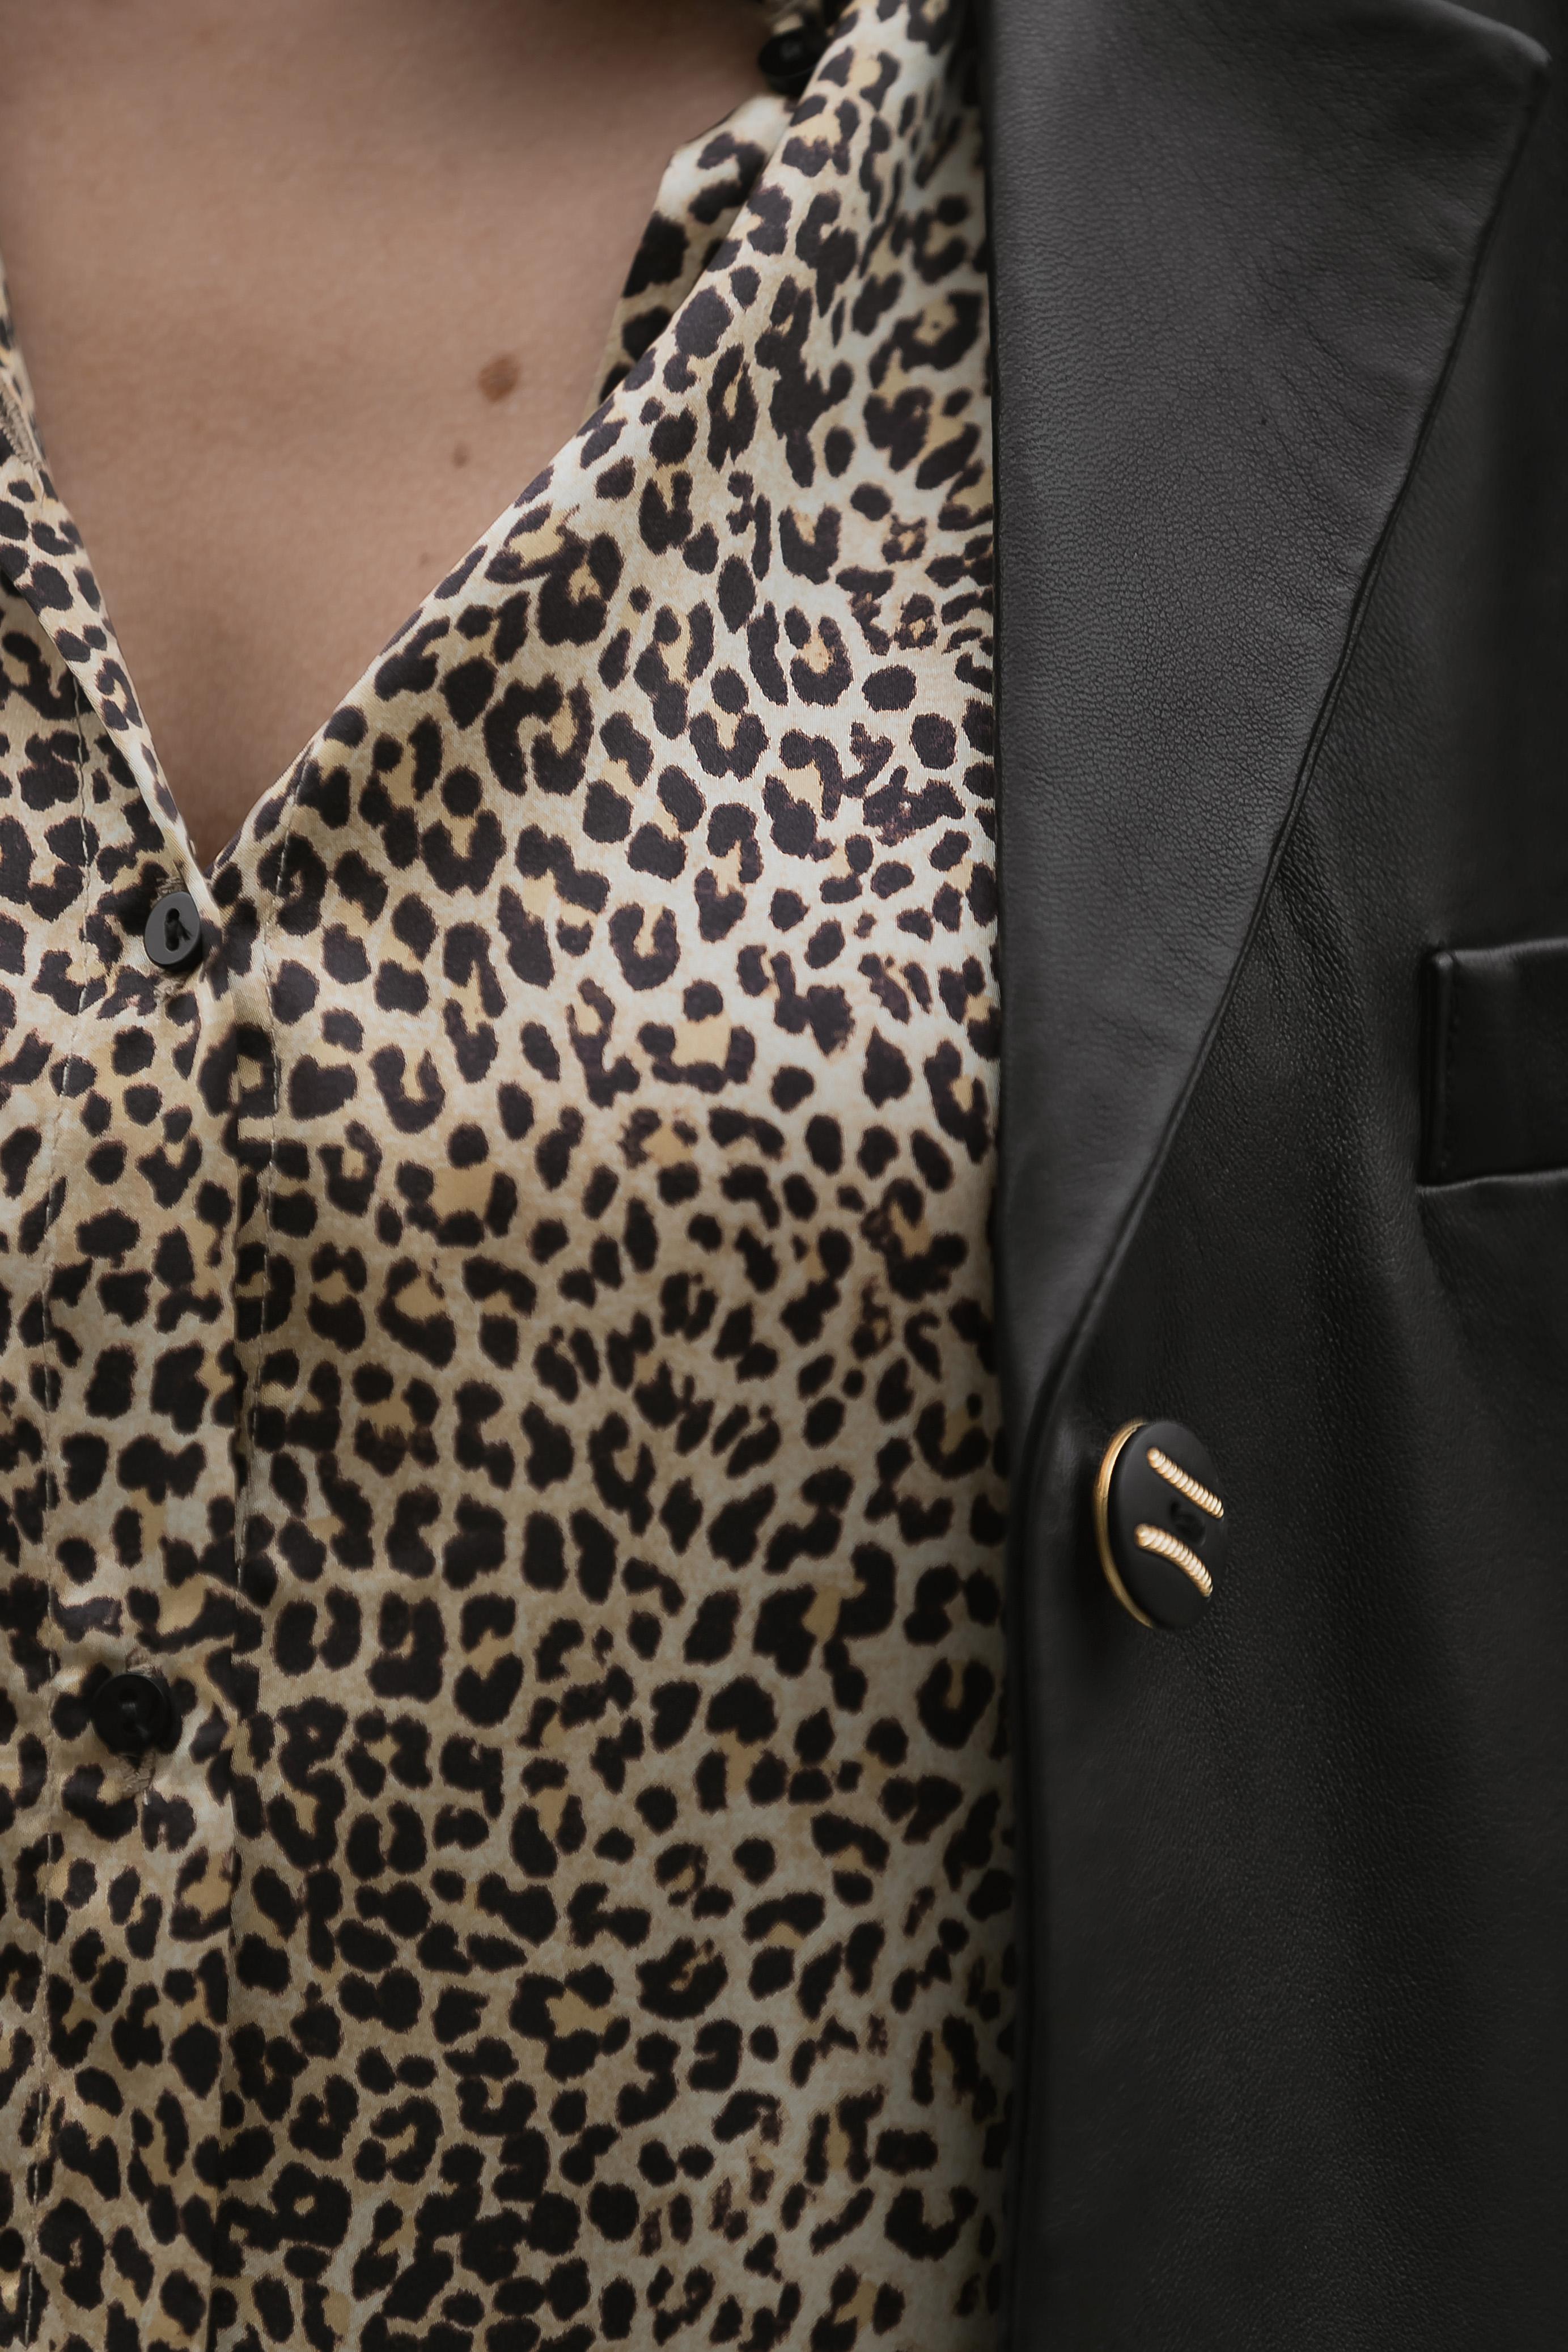 animalprint-bluse-kombinieren-herbst-winter-inspiration-outfit-style